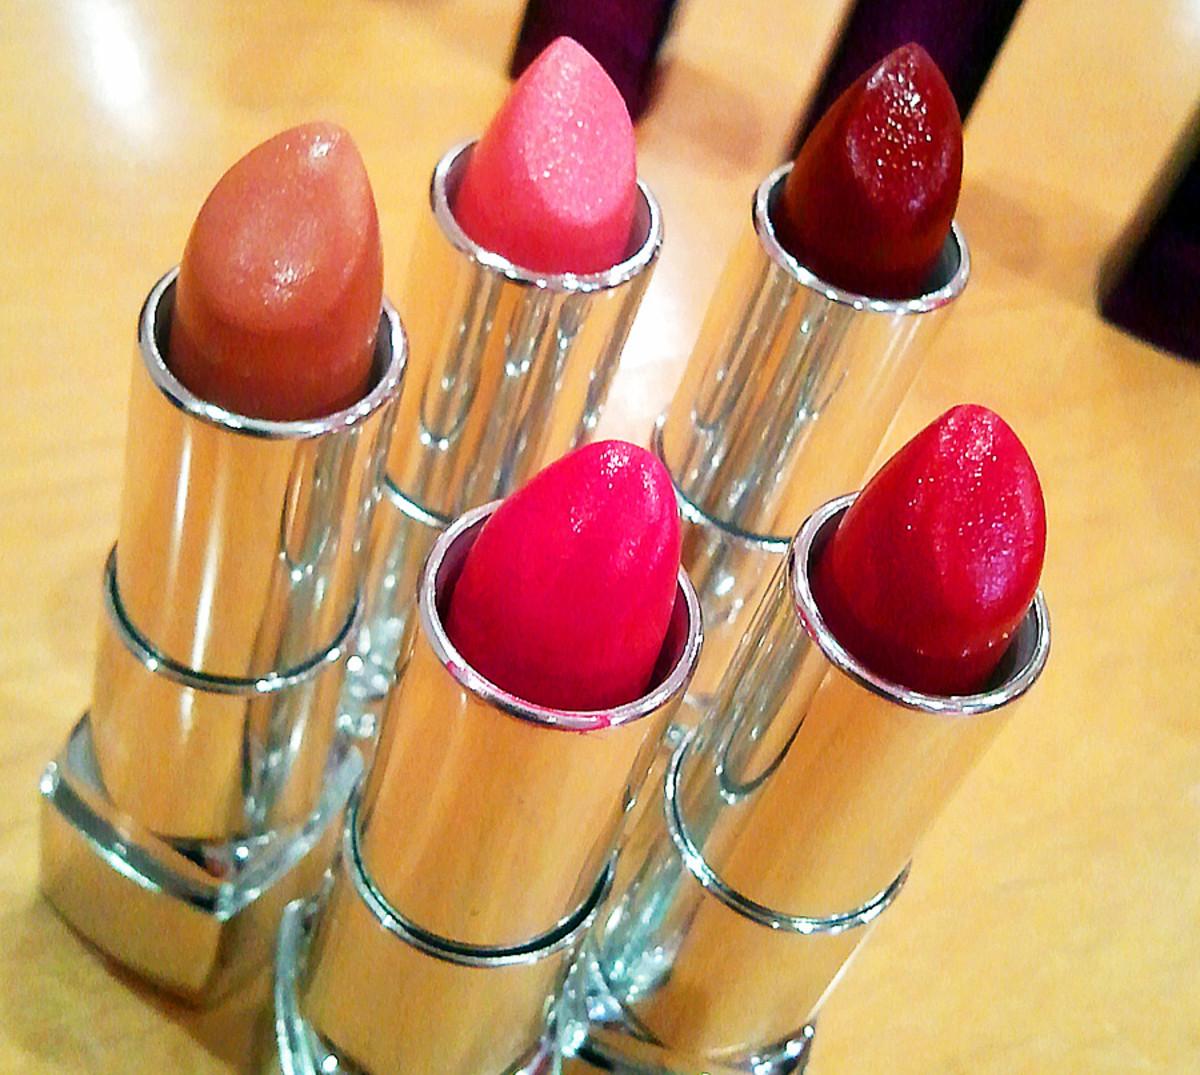 Rimmel London Fall 2014_Rimmel London Moisture Renew Lipstick 2014